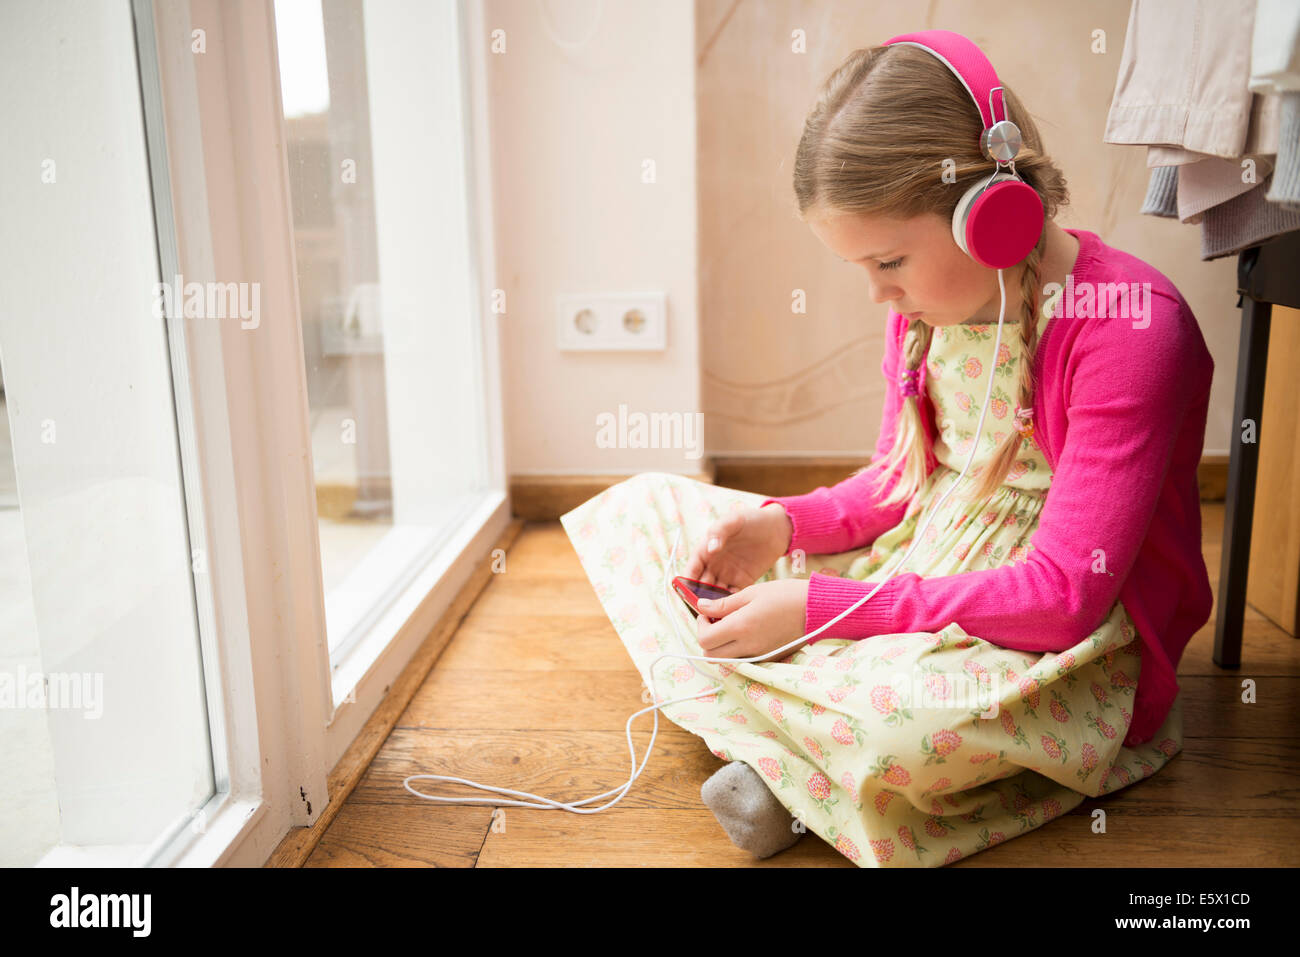 Girl sitting on floor selecting music for headphones - Stock Image